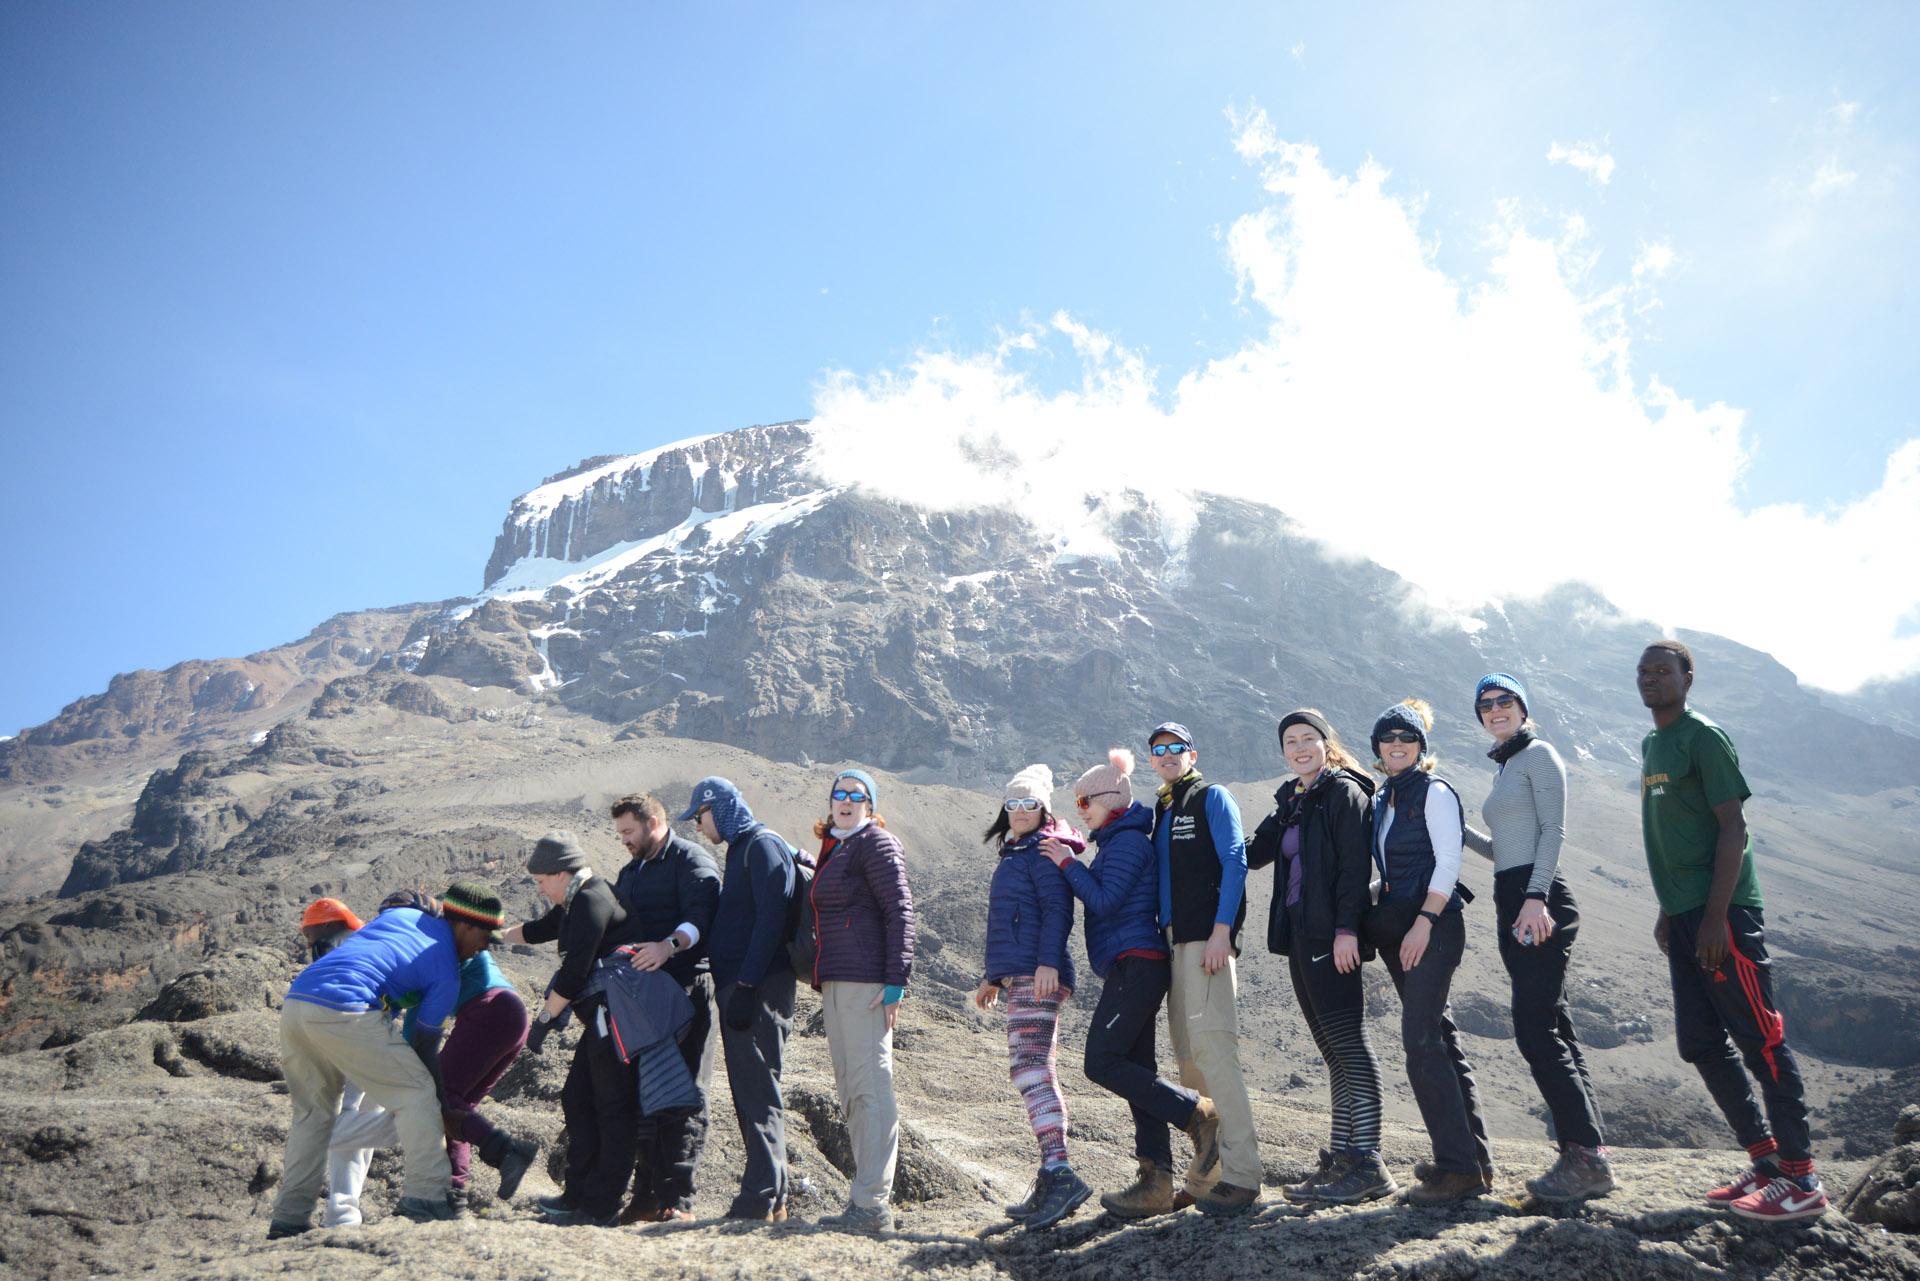 Kilimanjaro trekking holiday: 6 Days Machame route climb